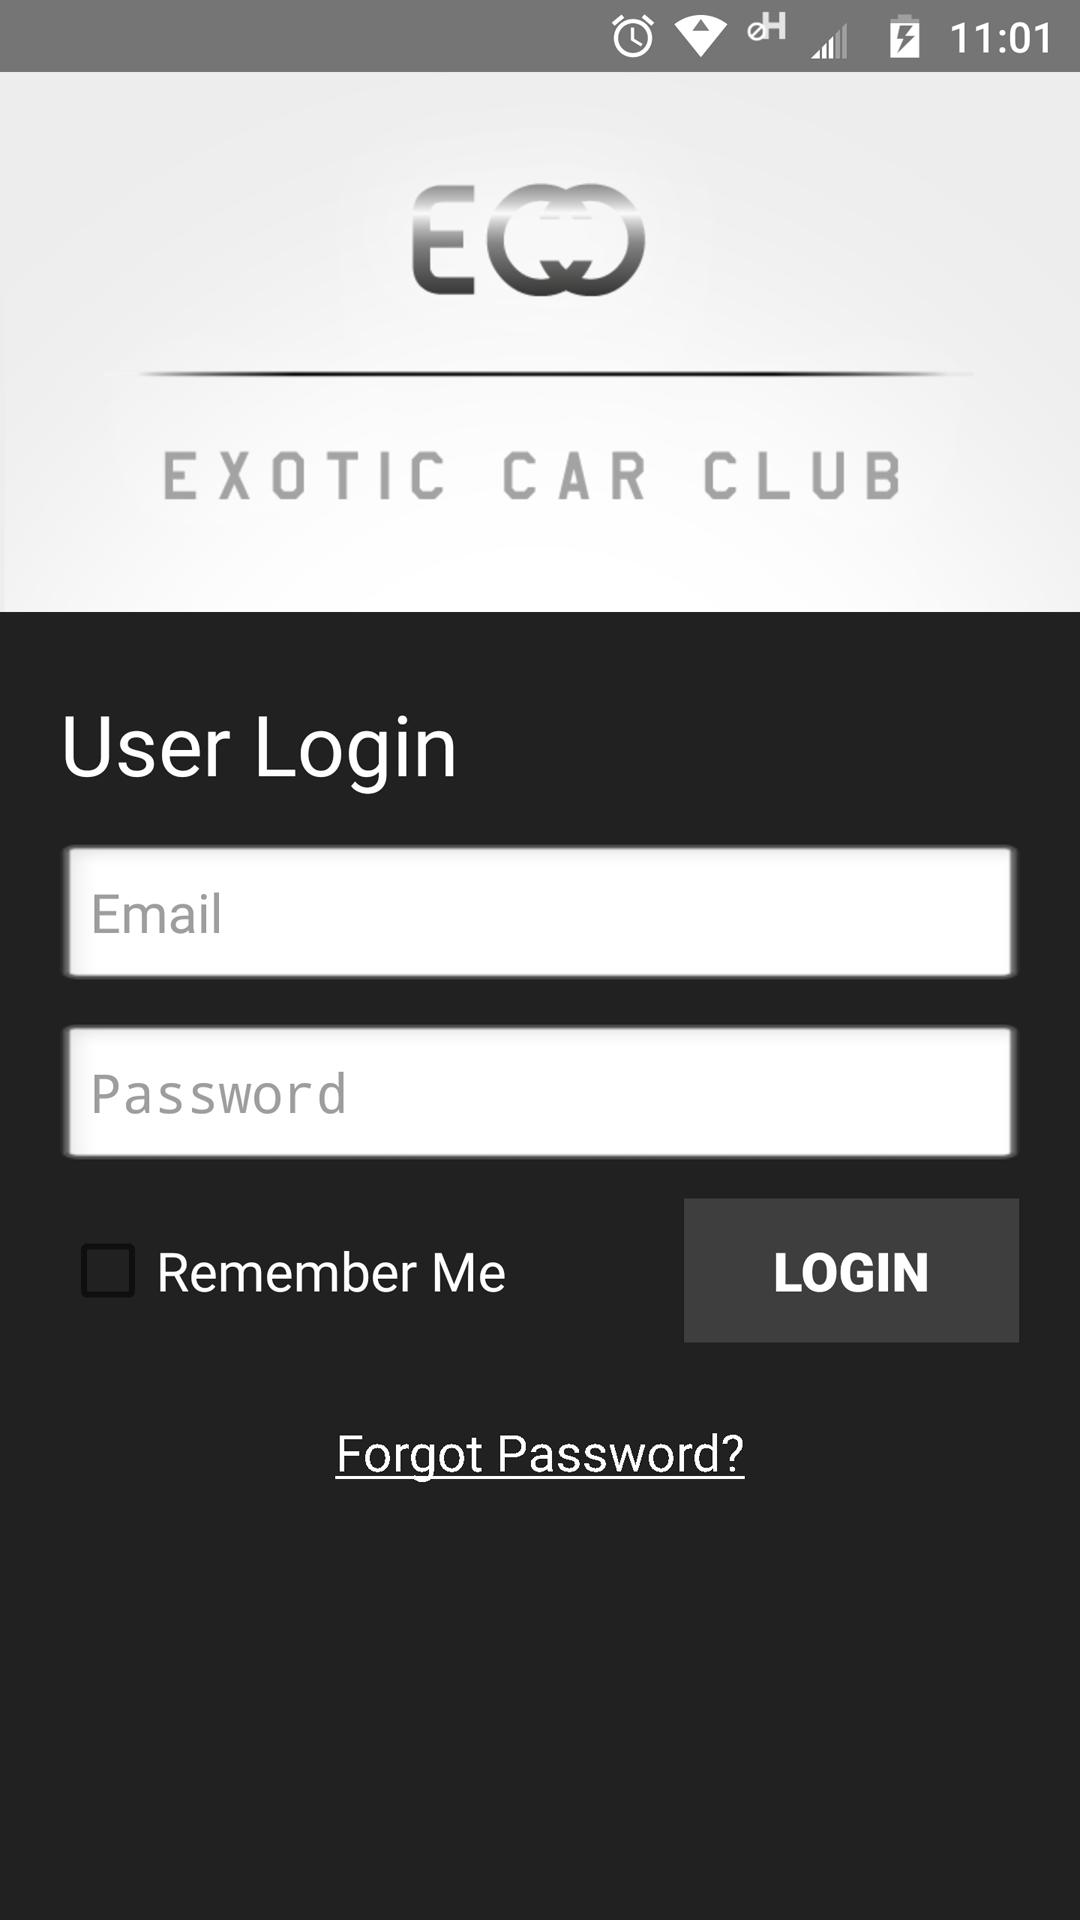 Exotic Car Club